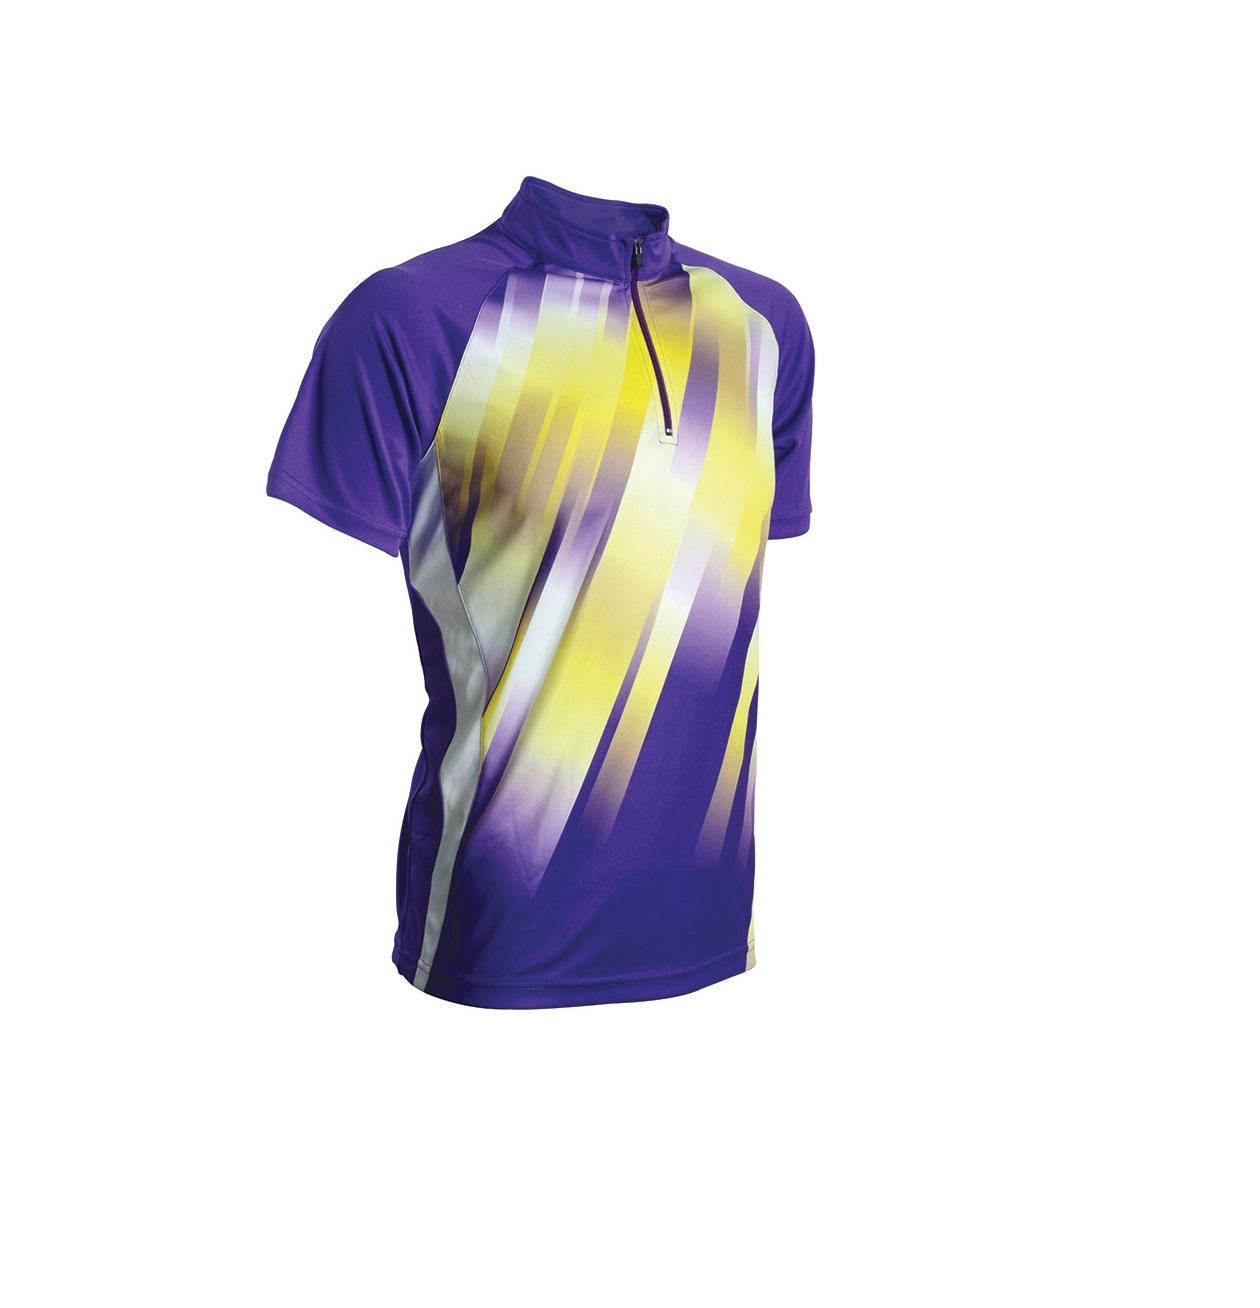 3 color t shirt printing arts arts for Colour t shirt printing